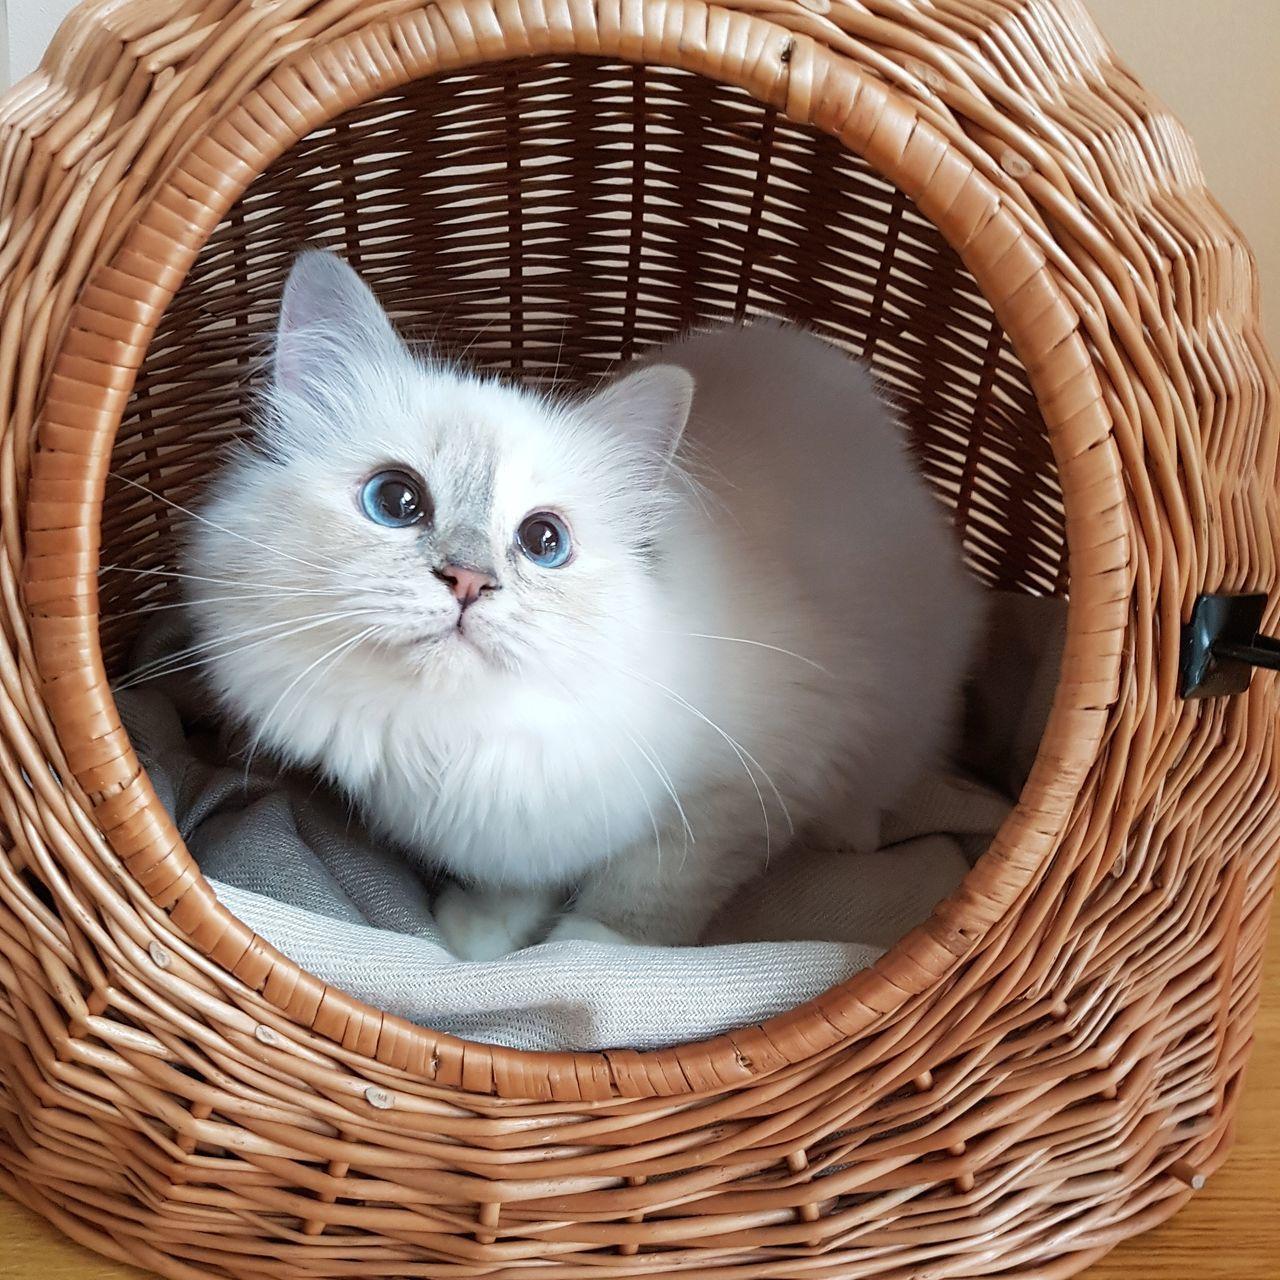 Pets Domestic Cat Basket Katze Cat Kitten Birman  Blaue Augen